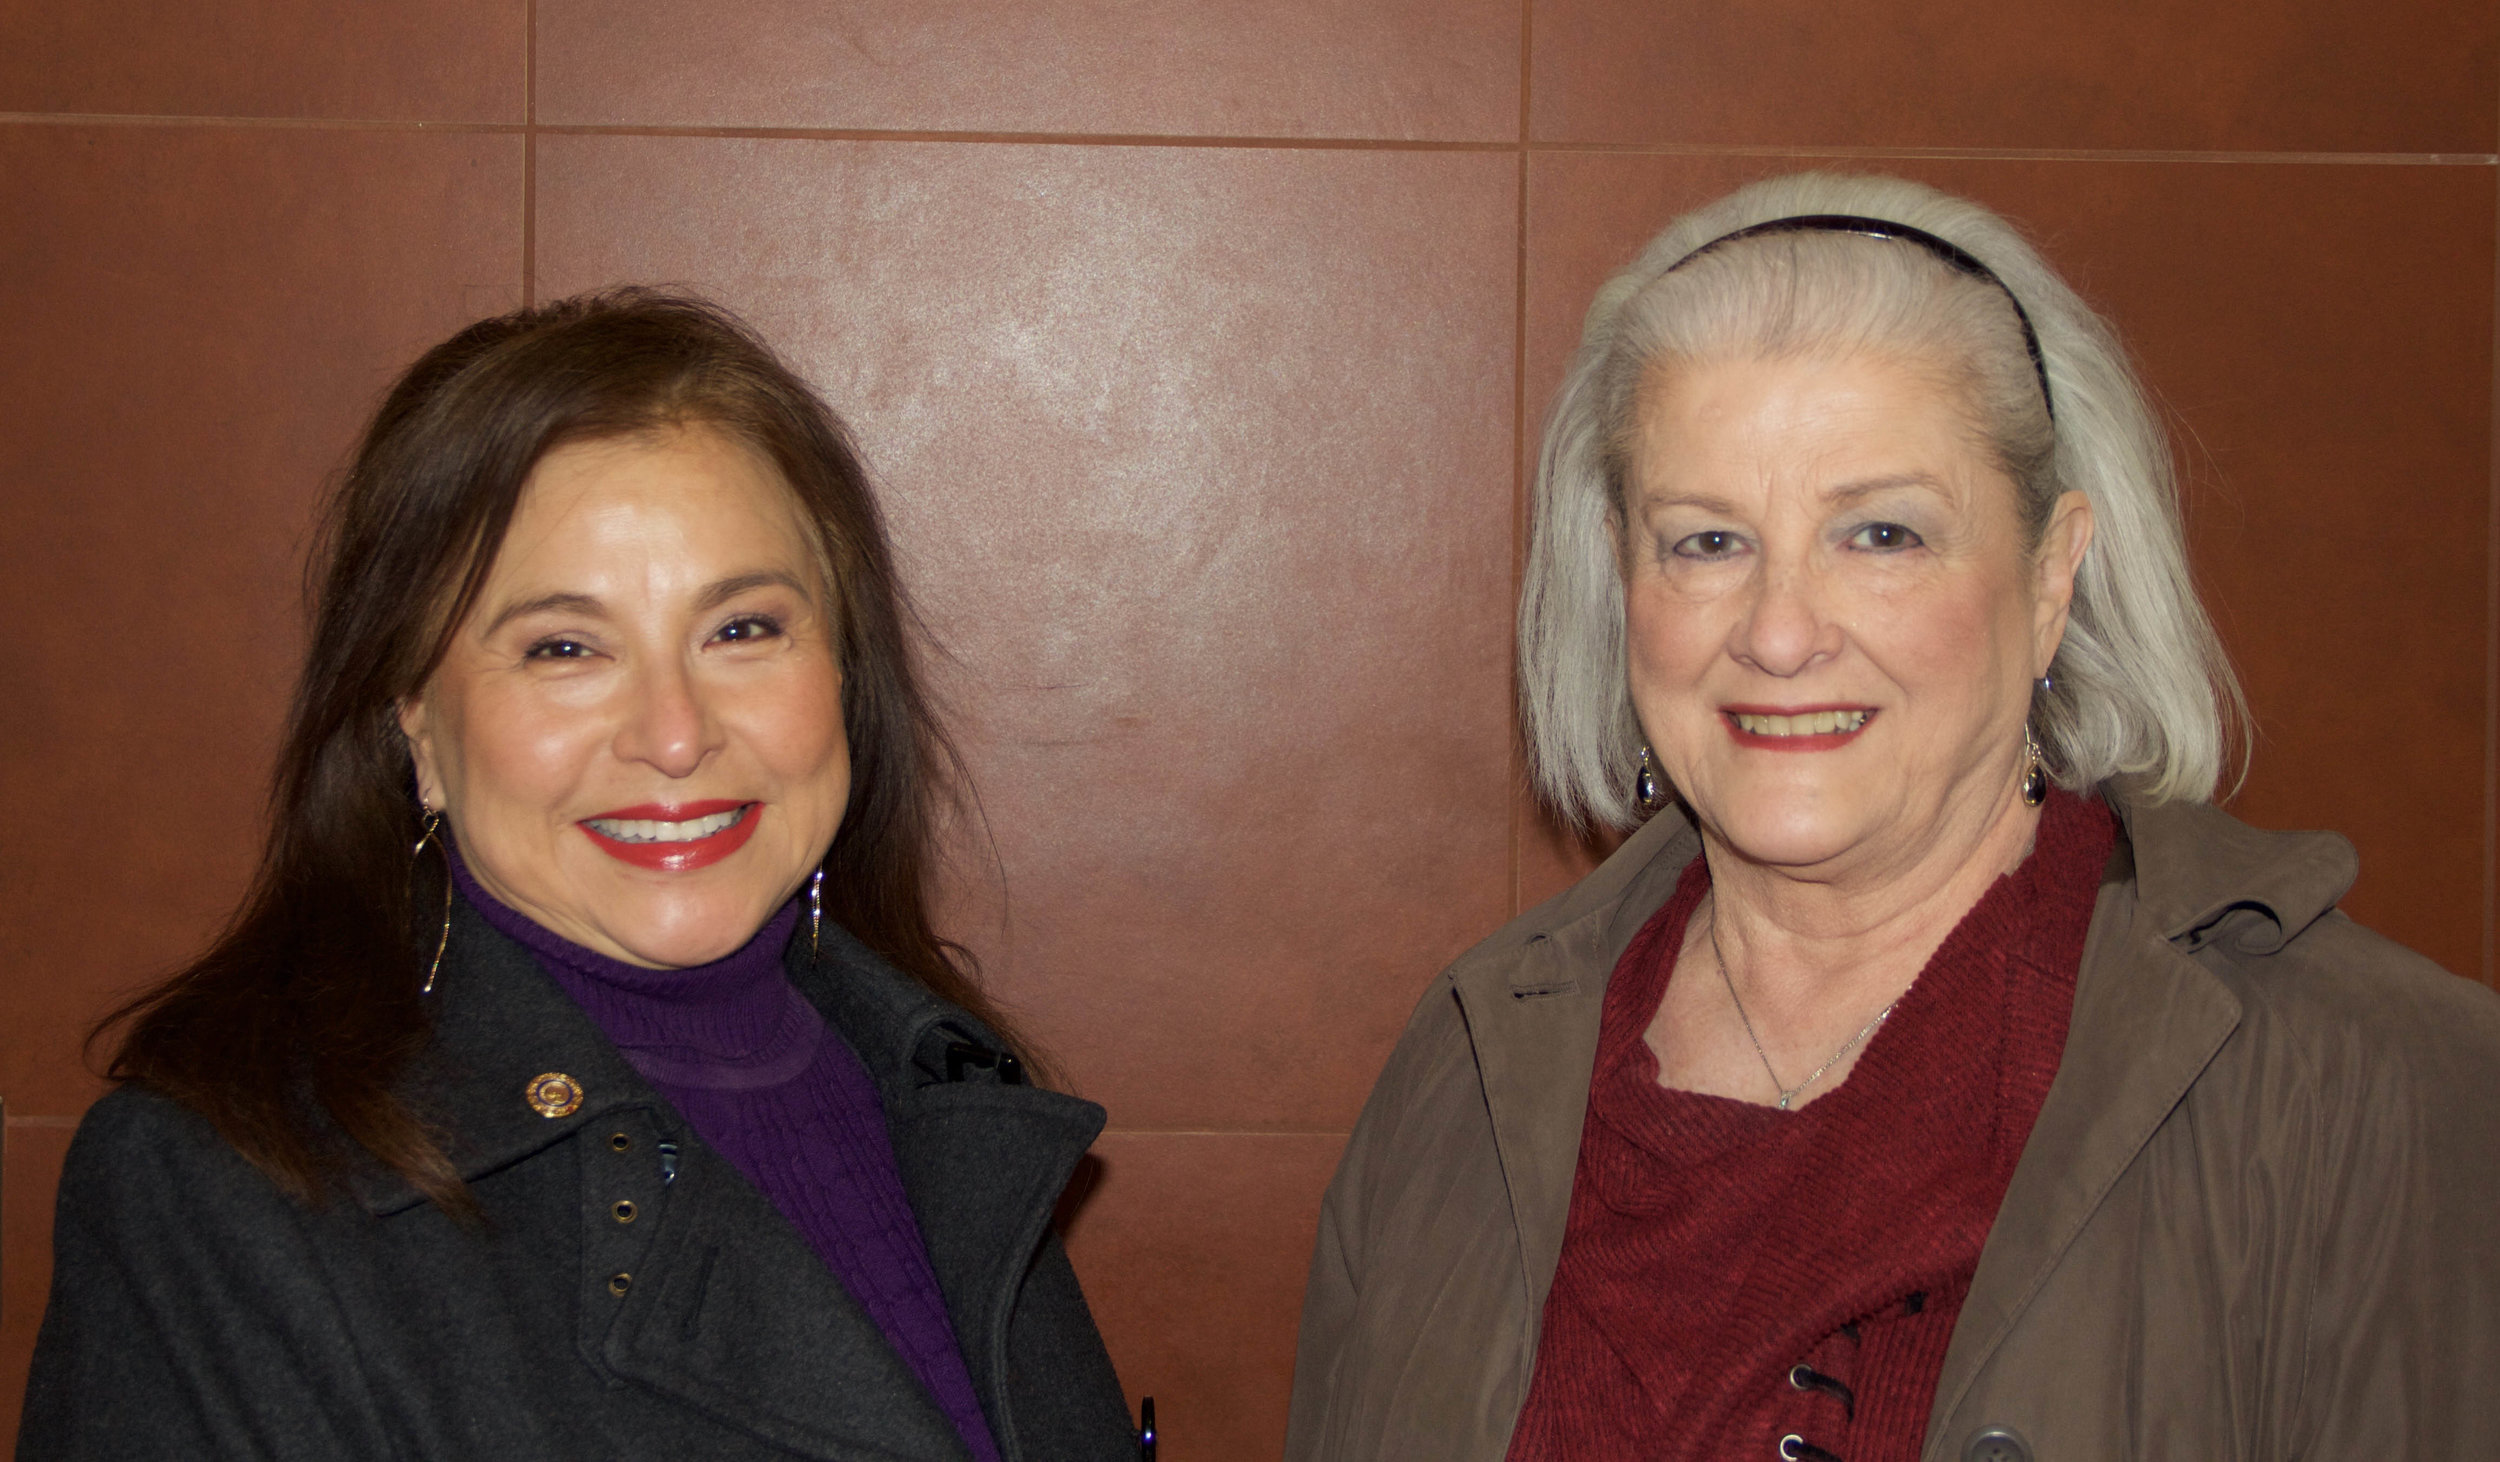 Mary Wormington and Amy Schulz